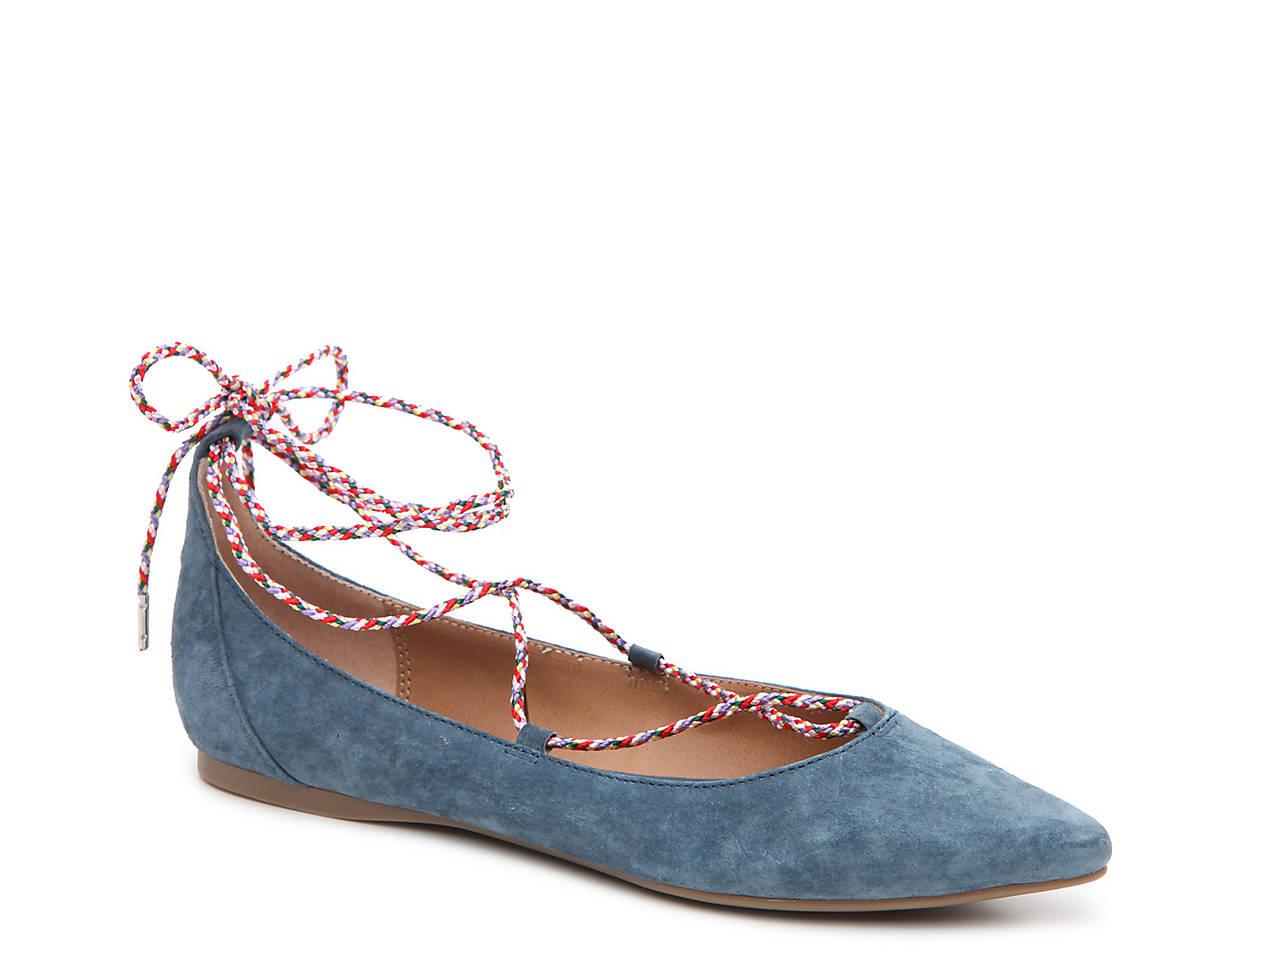 c4361723a2f3 Steve Madden Emilie Flat Women s Shoes